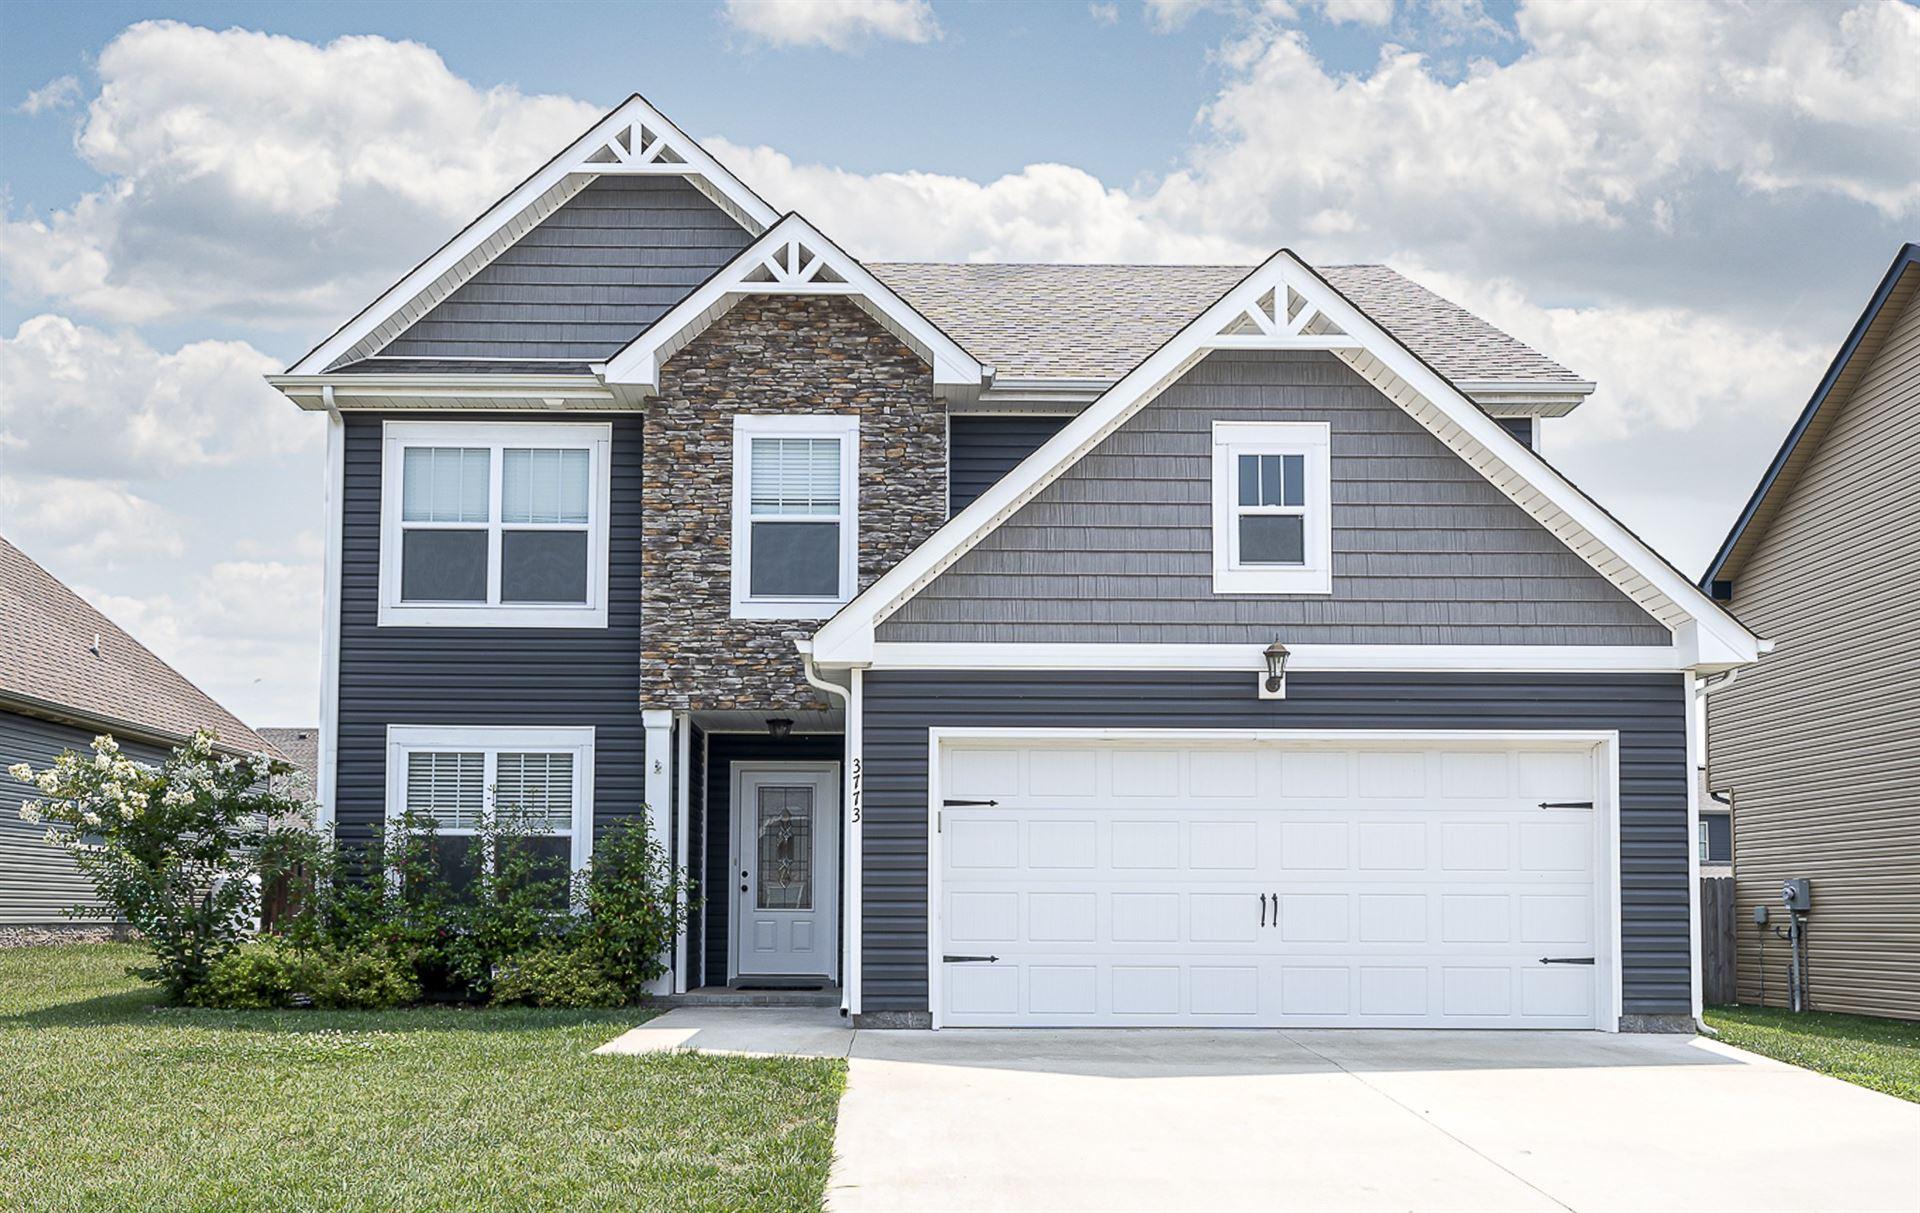 3773 Windhaven Dr, Clarksville, TN 37040 - MLS#: 2275832